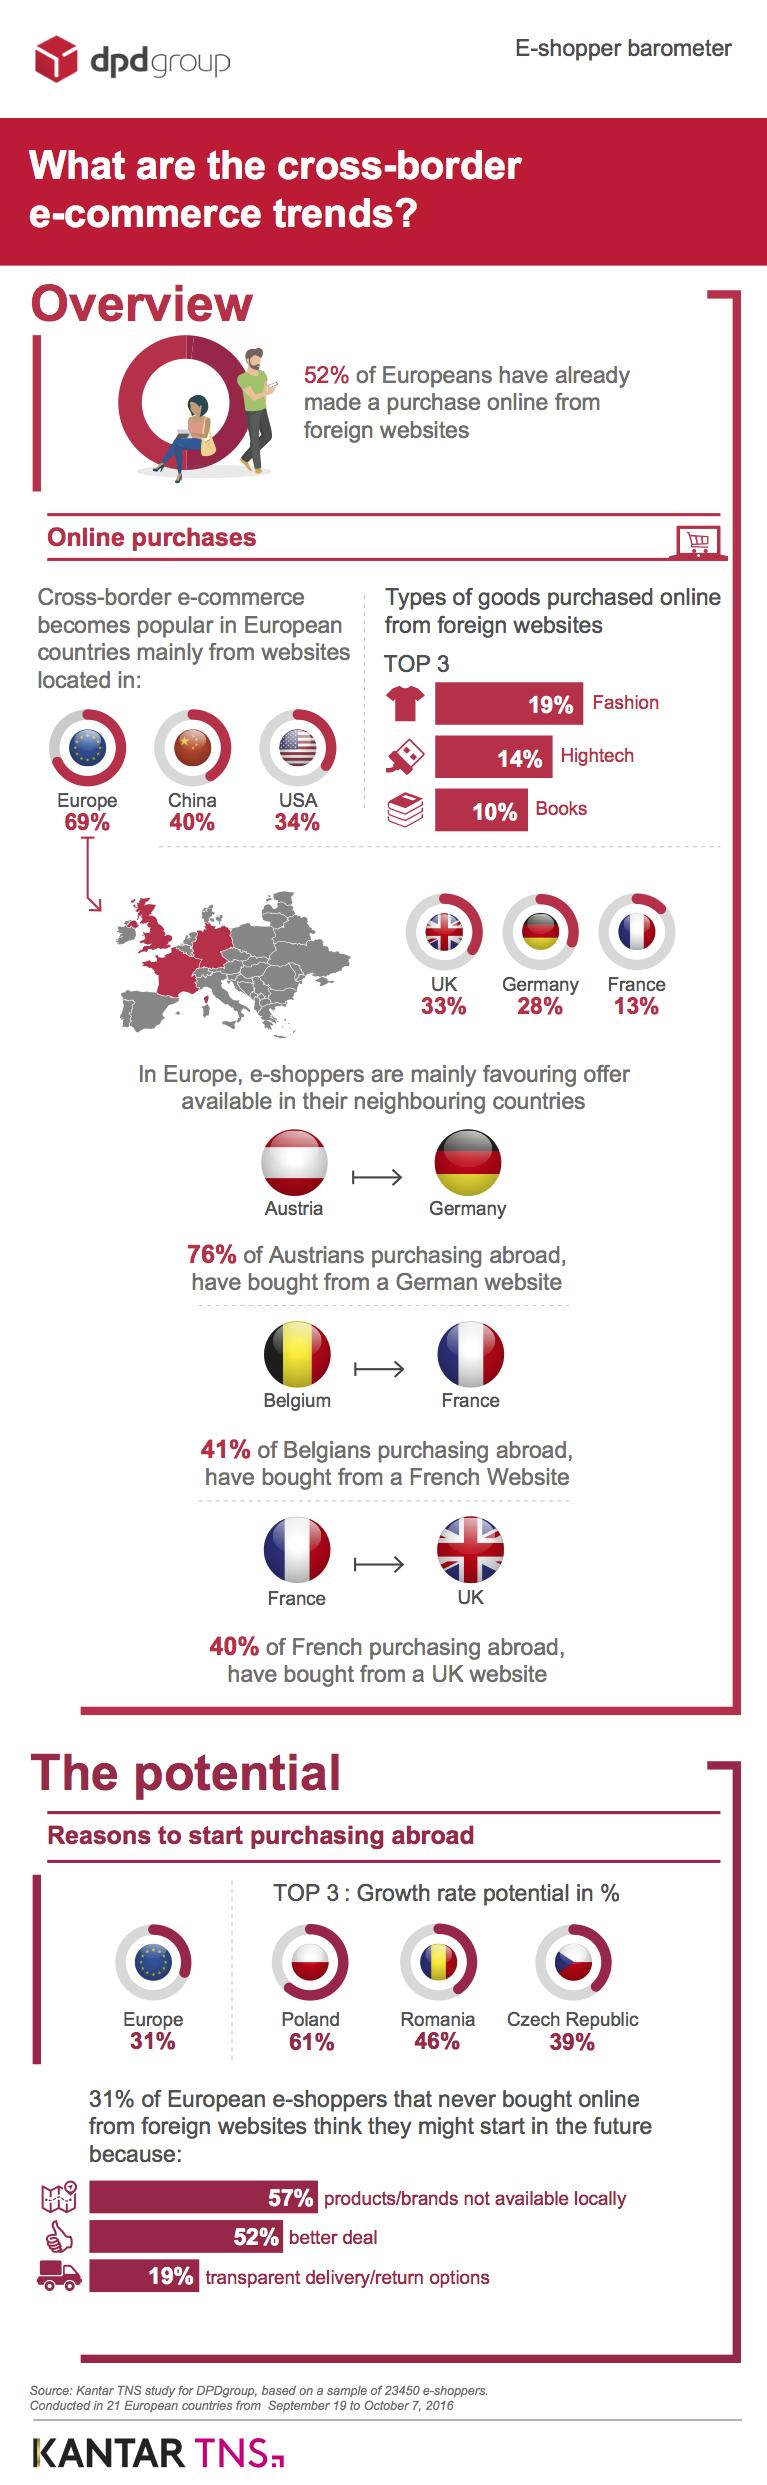 Customer experience cross-border